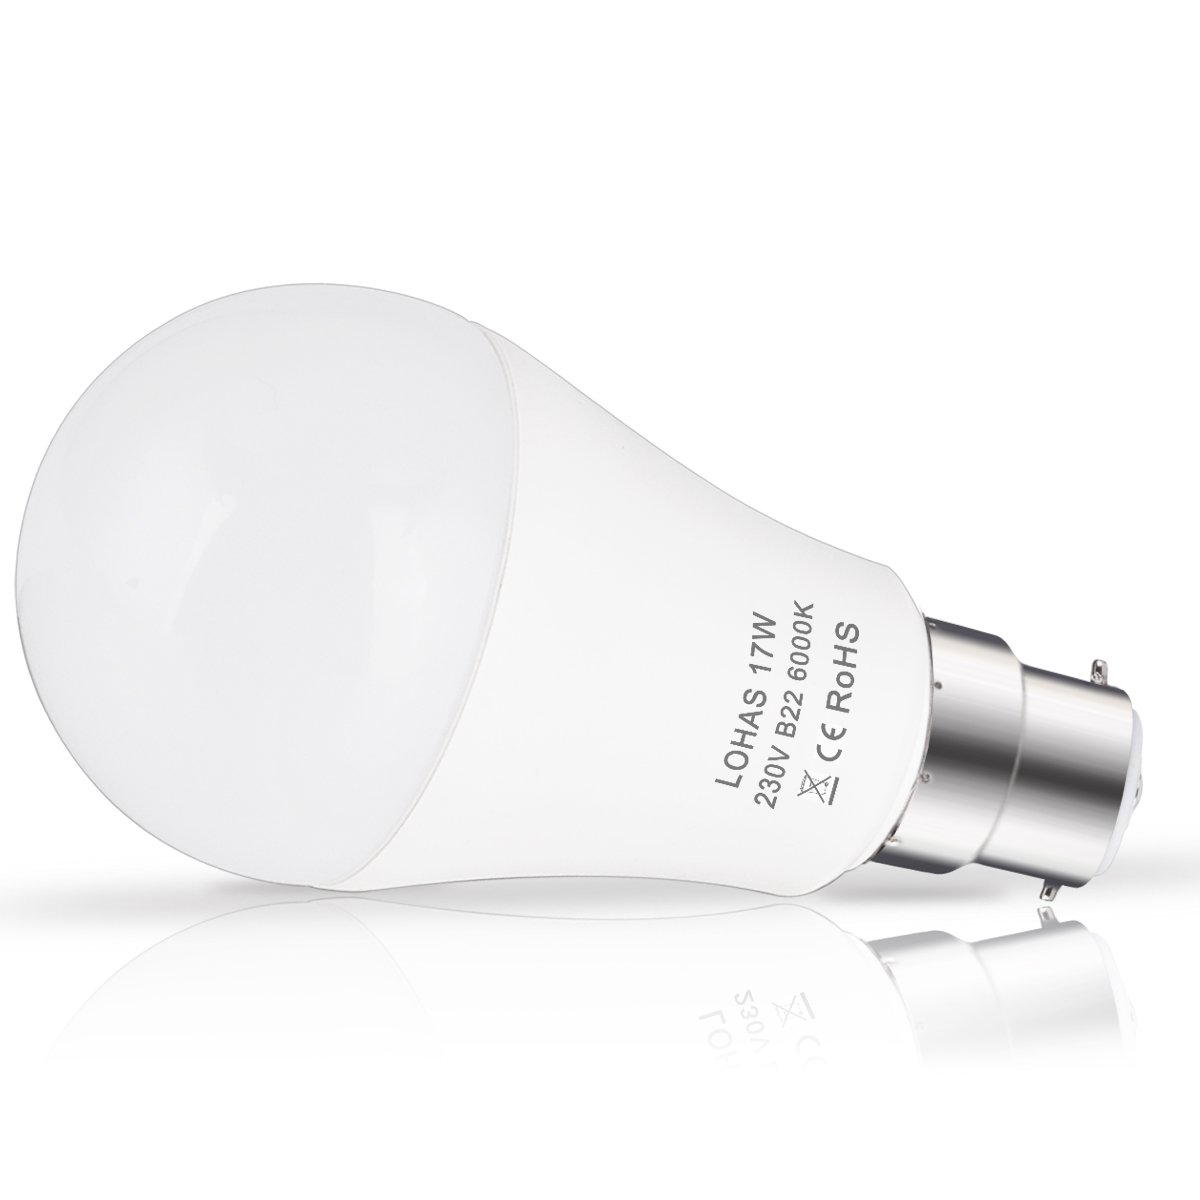 17W LED Bayonet Light 4 Pack Day White 6000K Energy Saving Light Bulbs Non-Dimmable Super Bright 1600Lm LOHAS B22 LED Bulbs 150W Equivalent